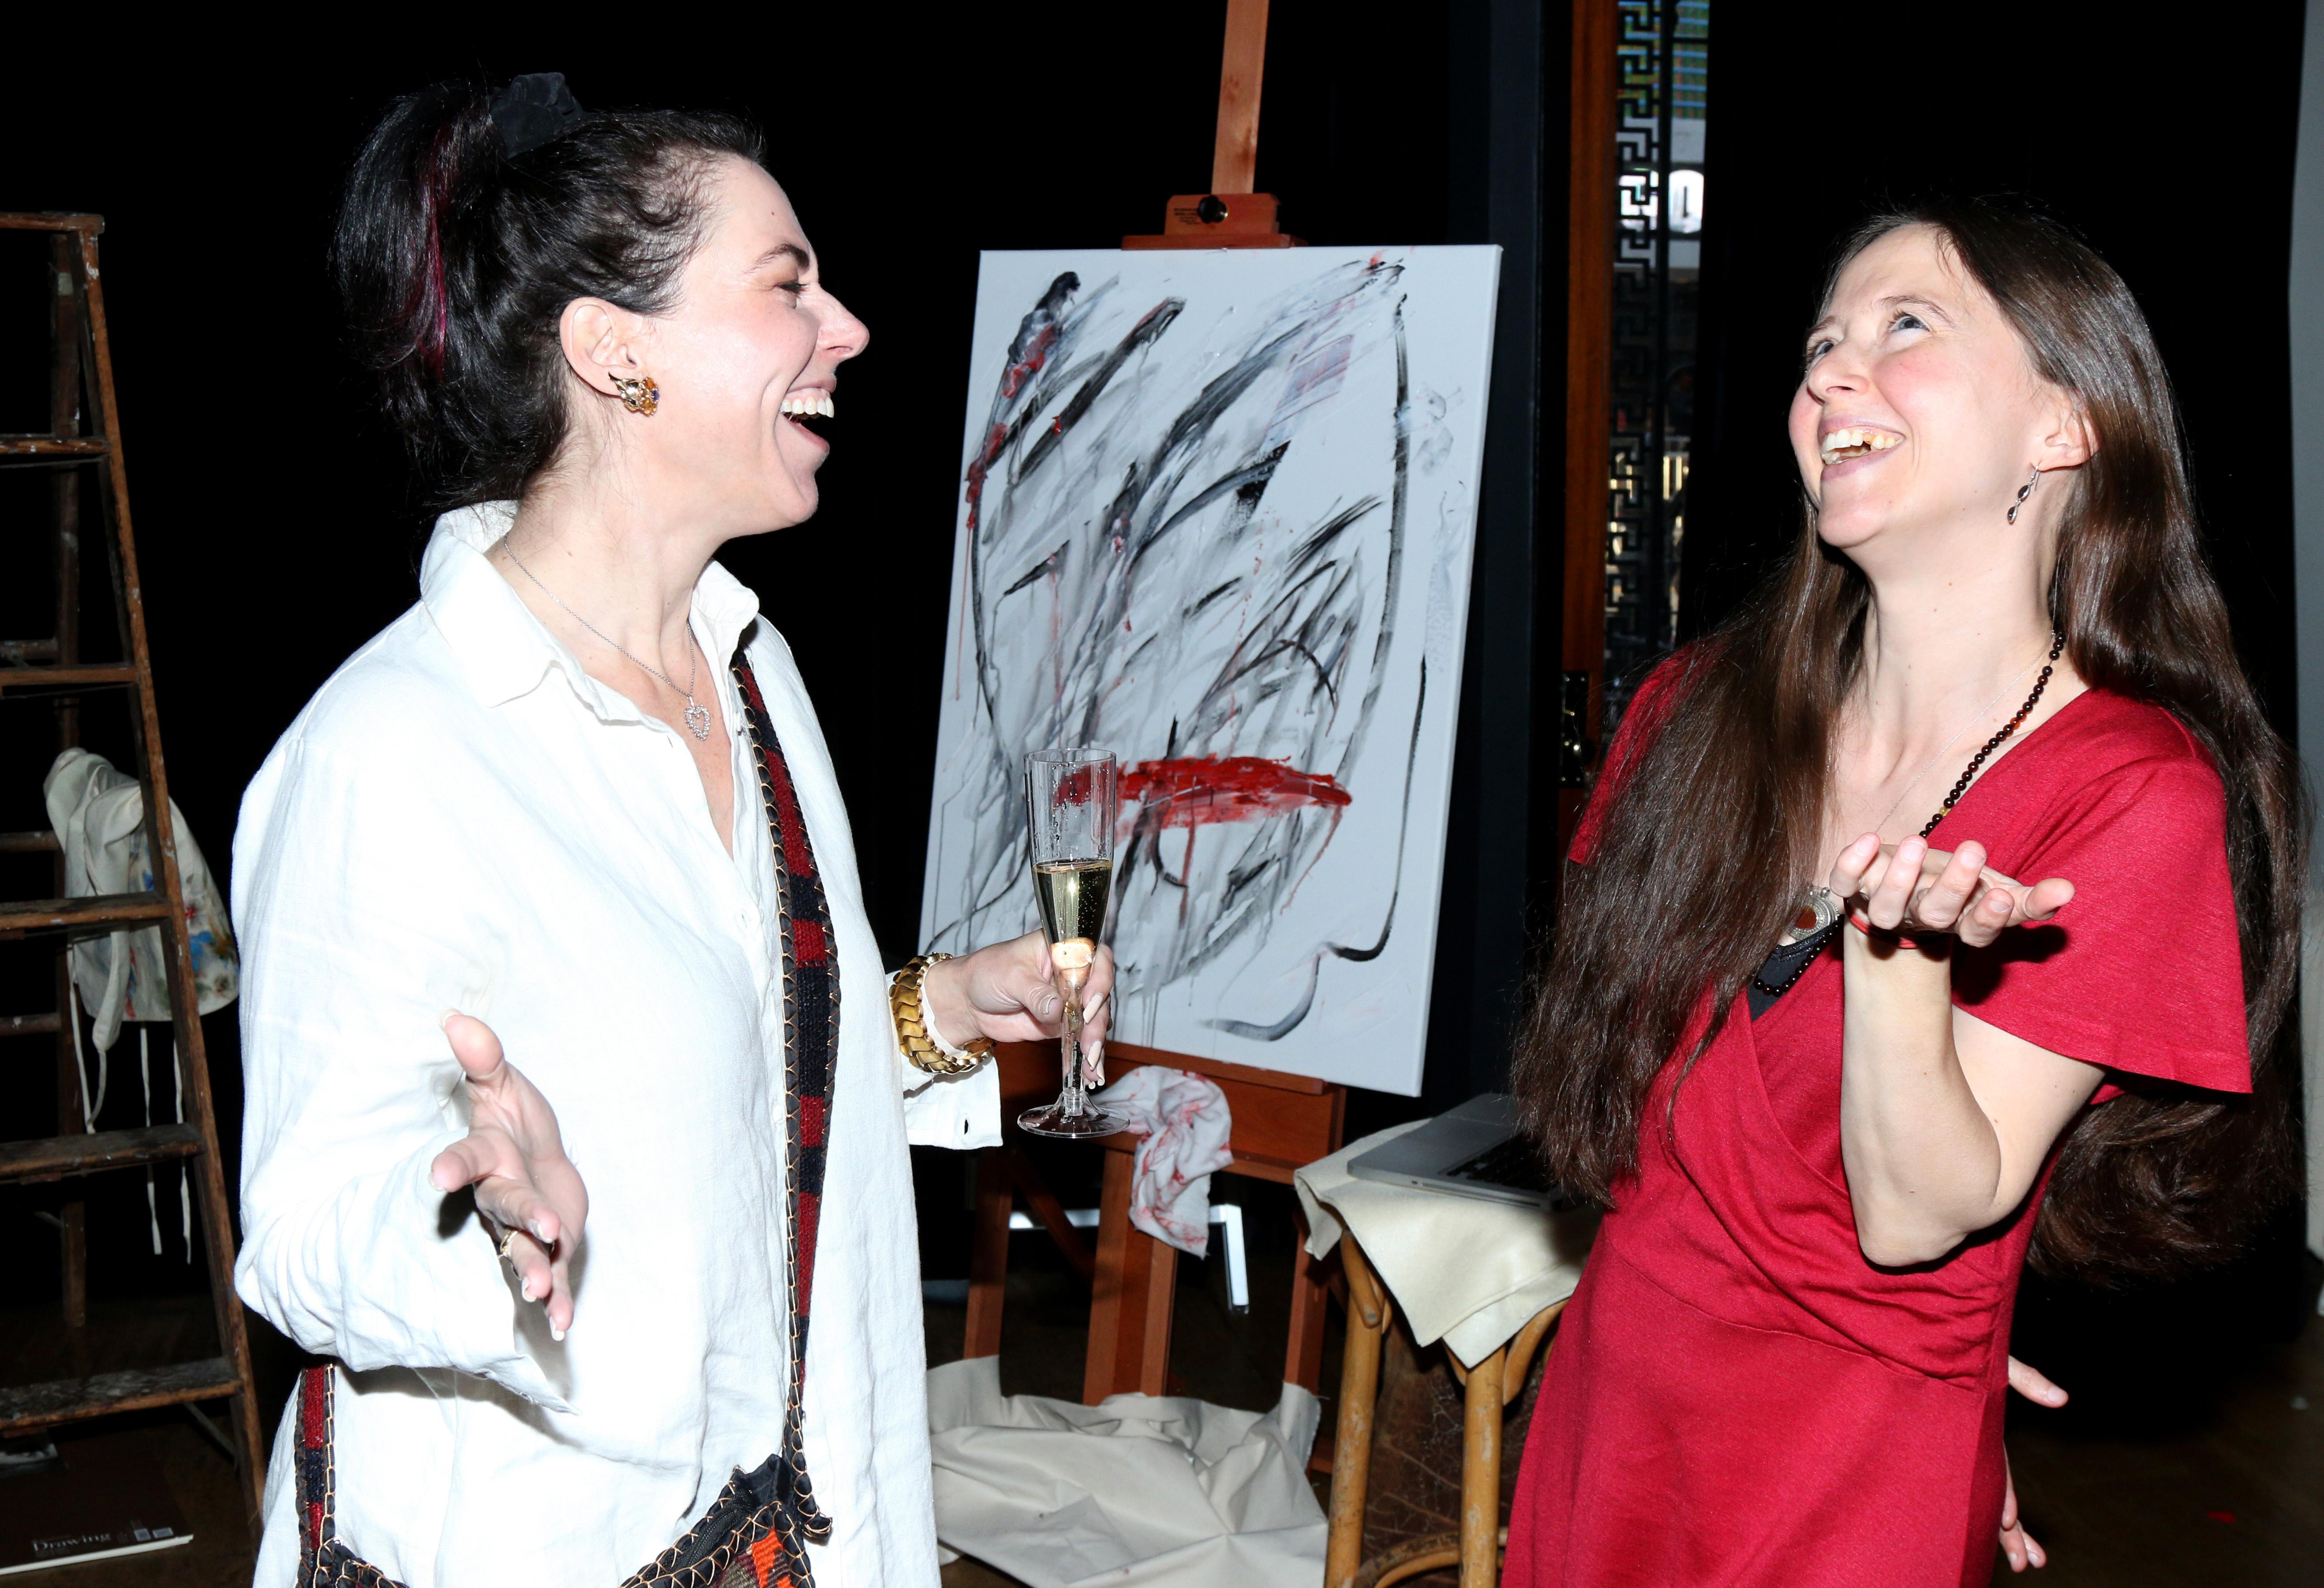 Producer Amanda Quinn Olivar with artist Elizabeth Phelps Meyer